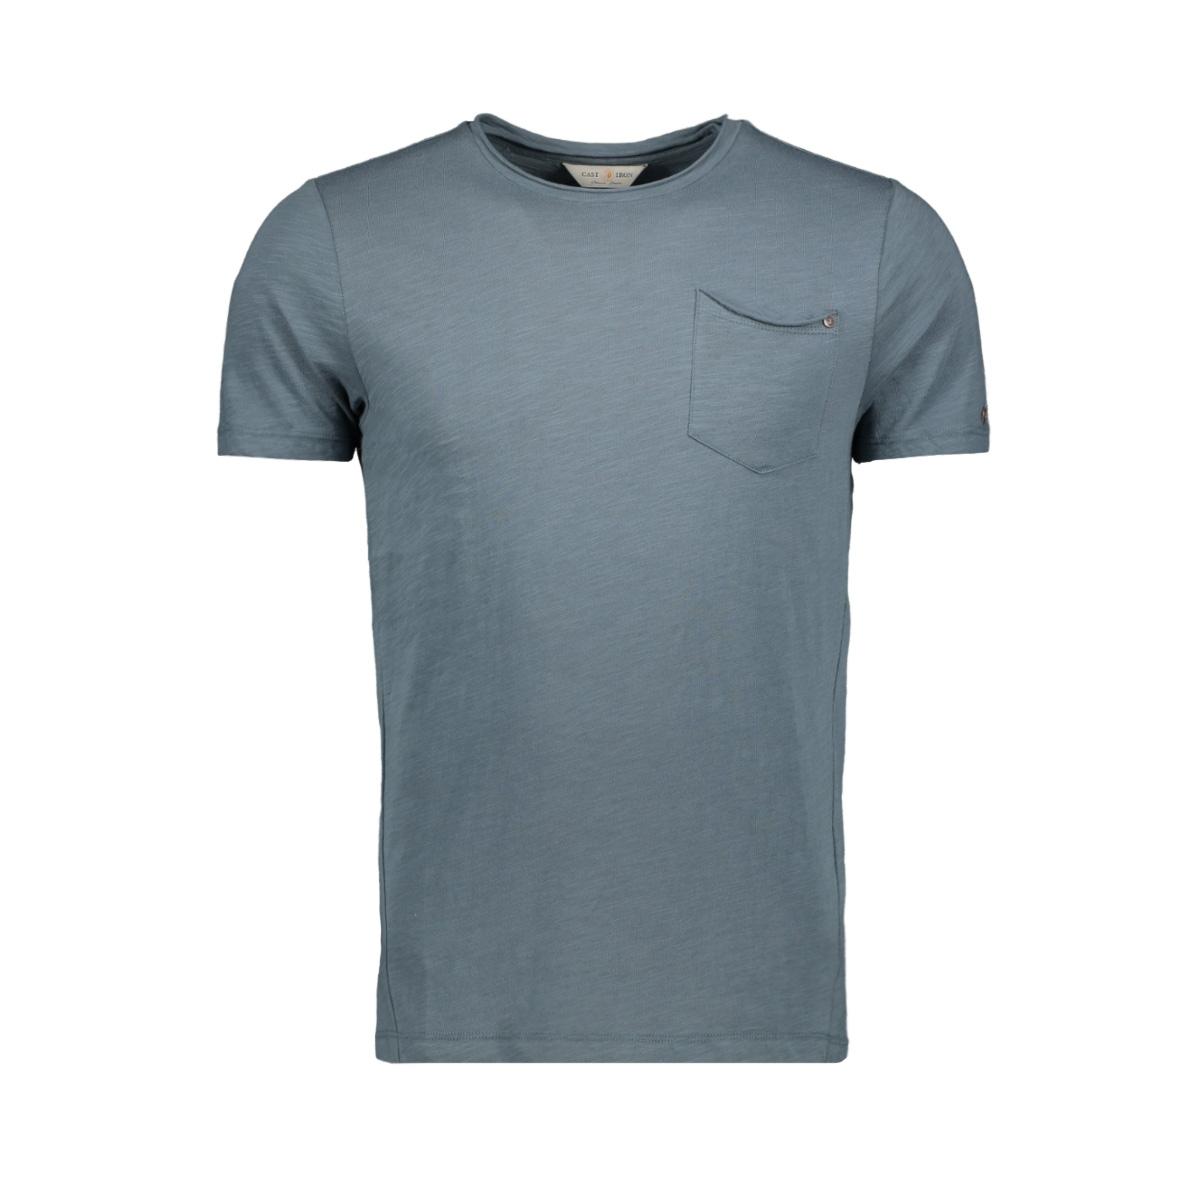 slub jersey t shirt ctss192300 cast iron t-shirt 5229